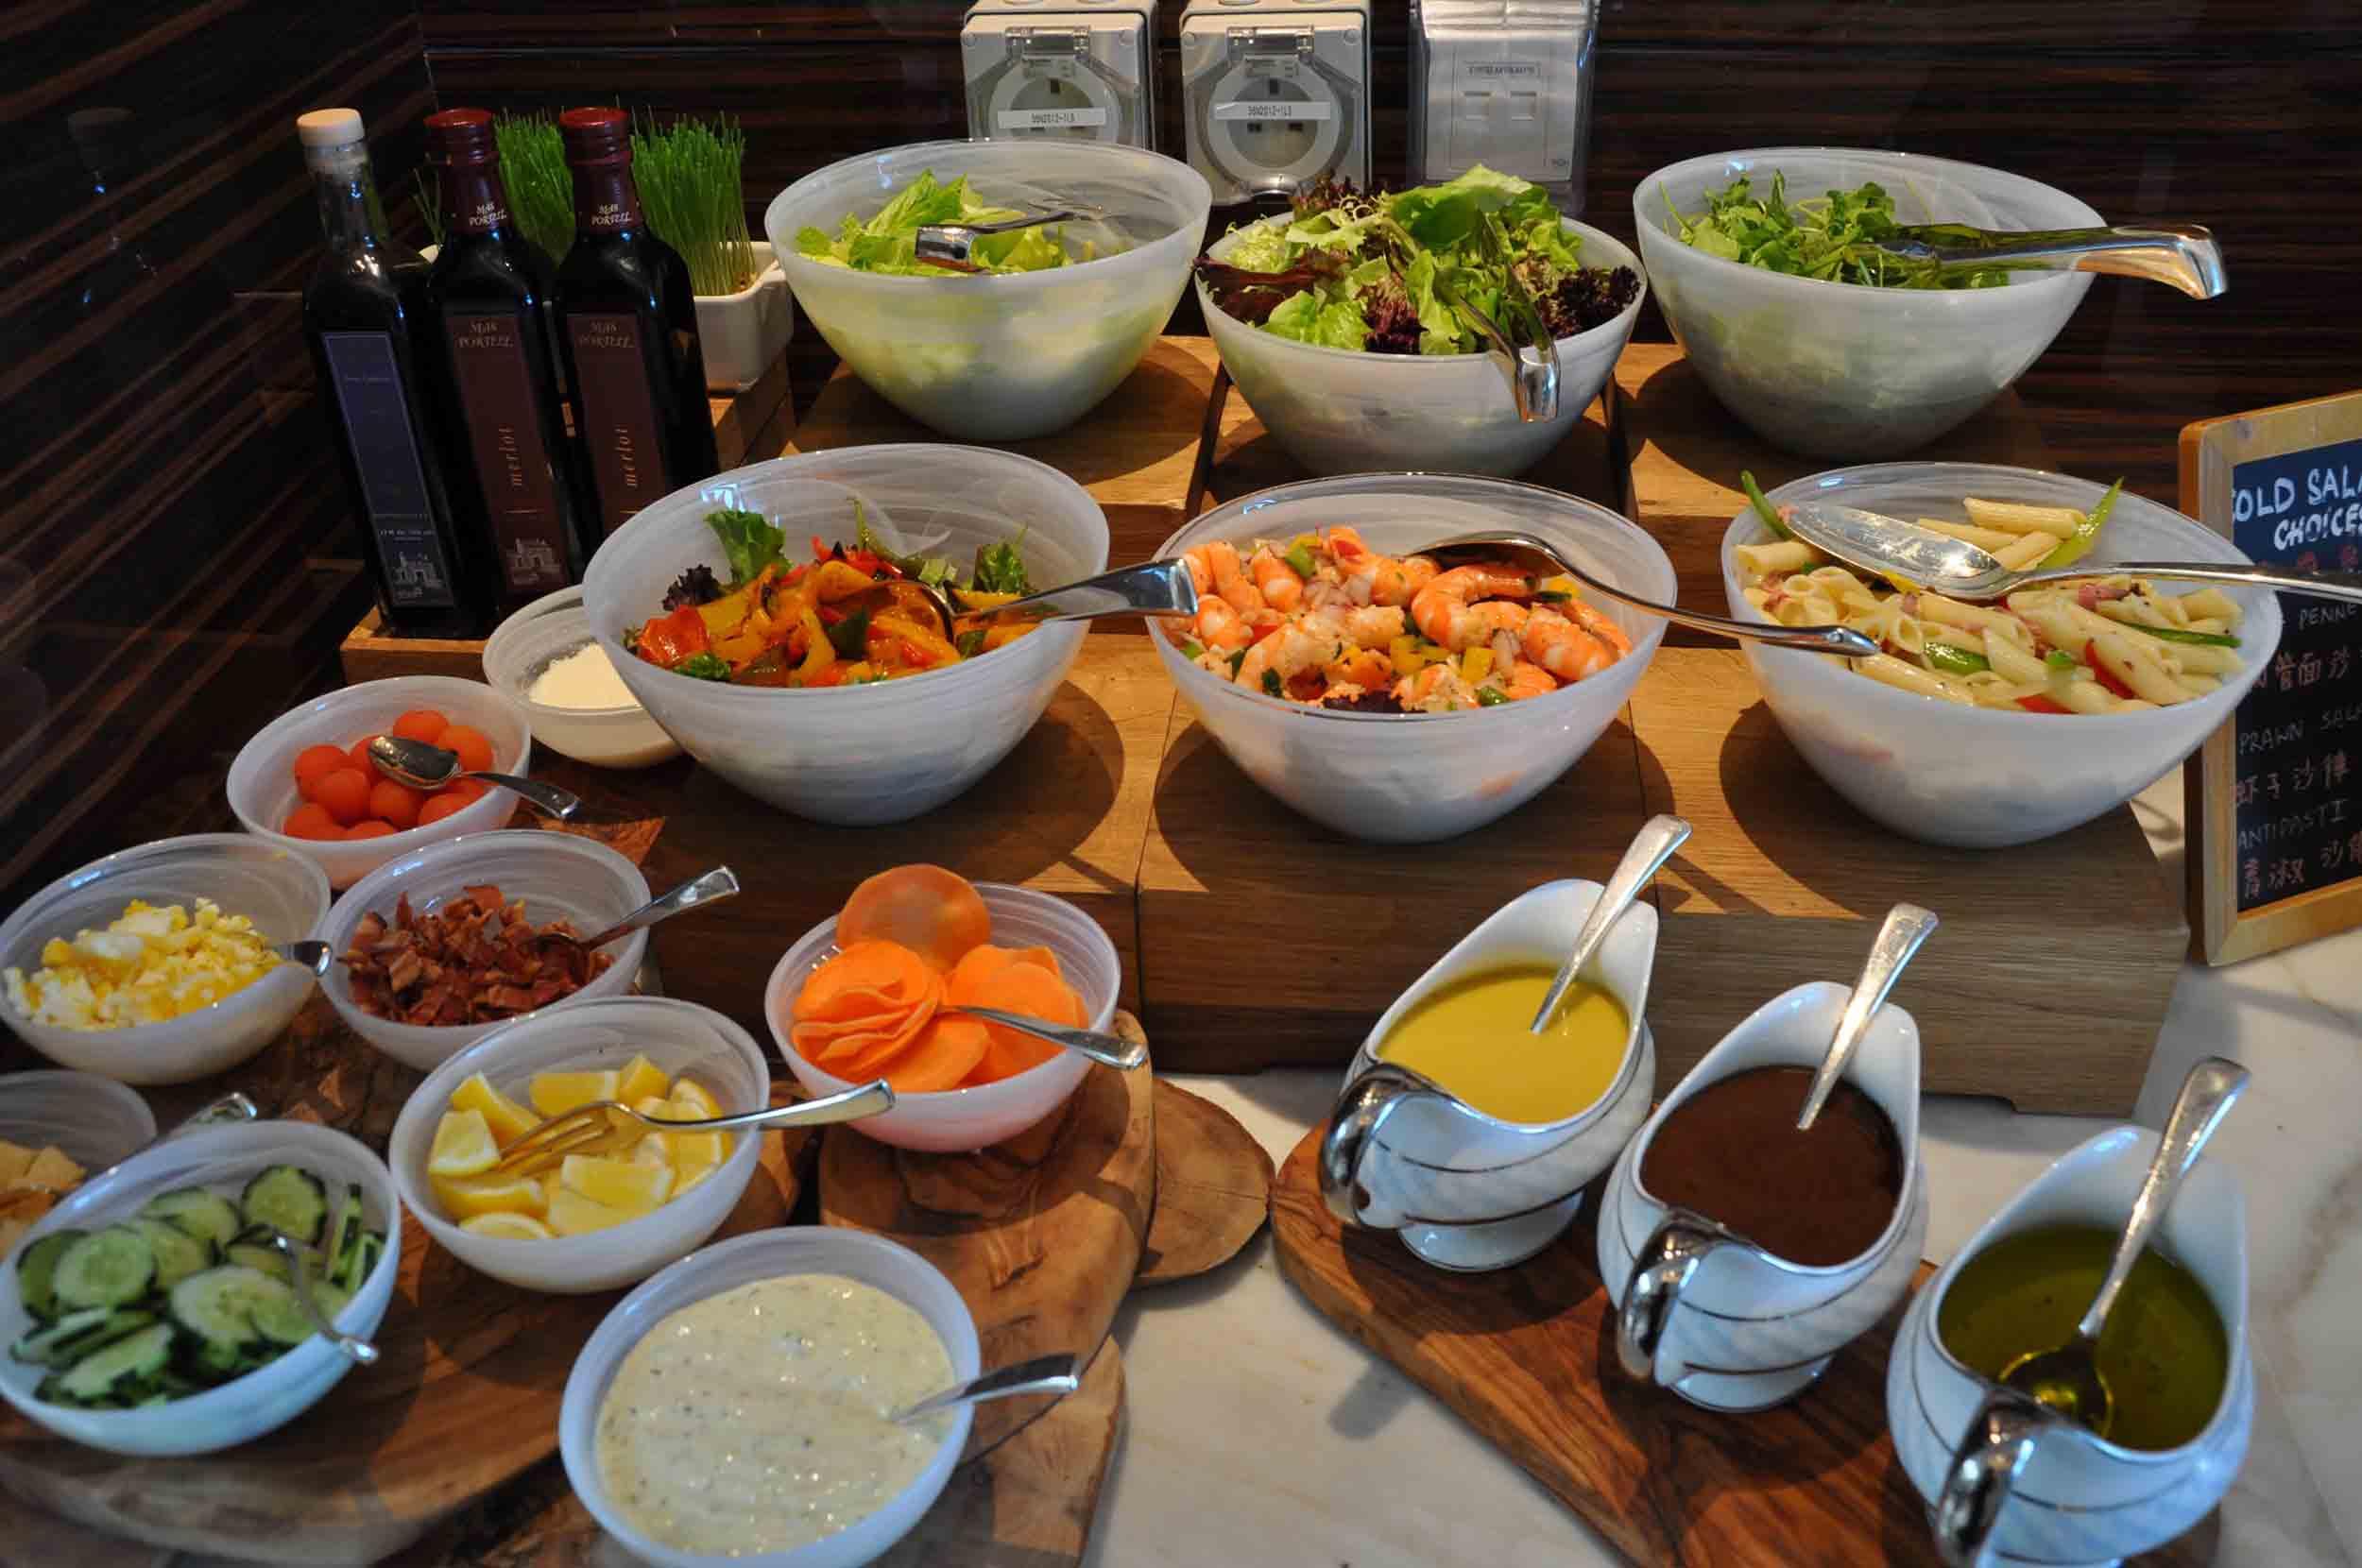 Ritz-Carlton Macau Club Lounge salad buffet